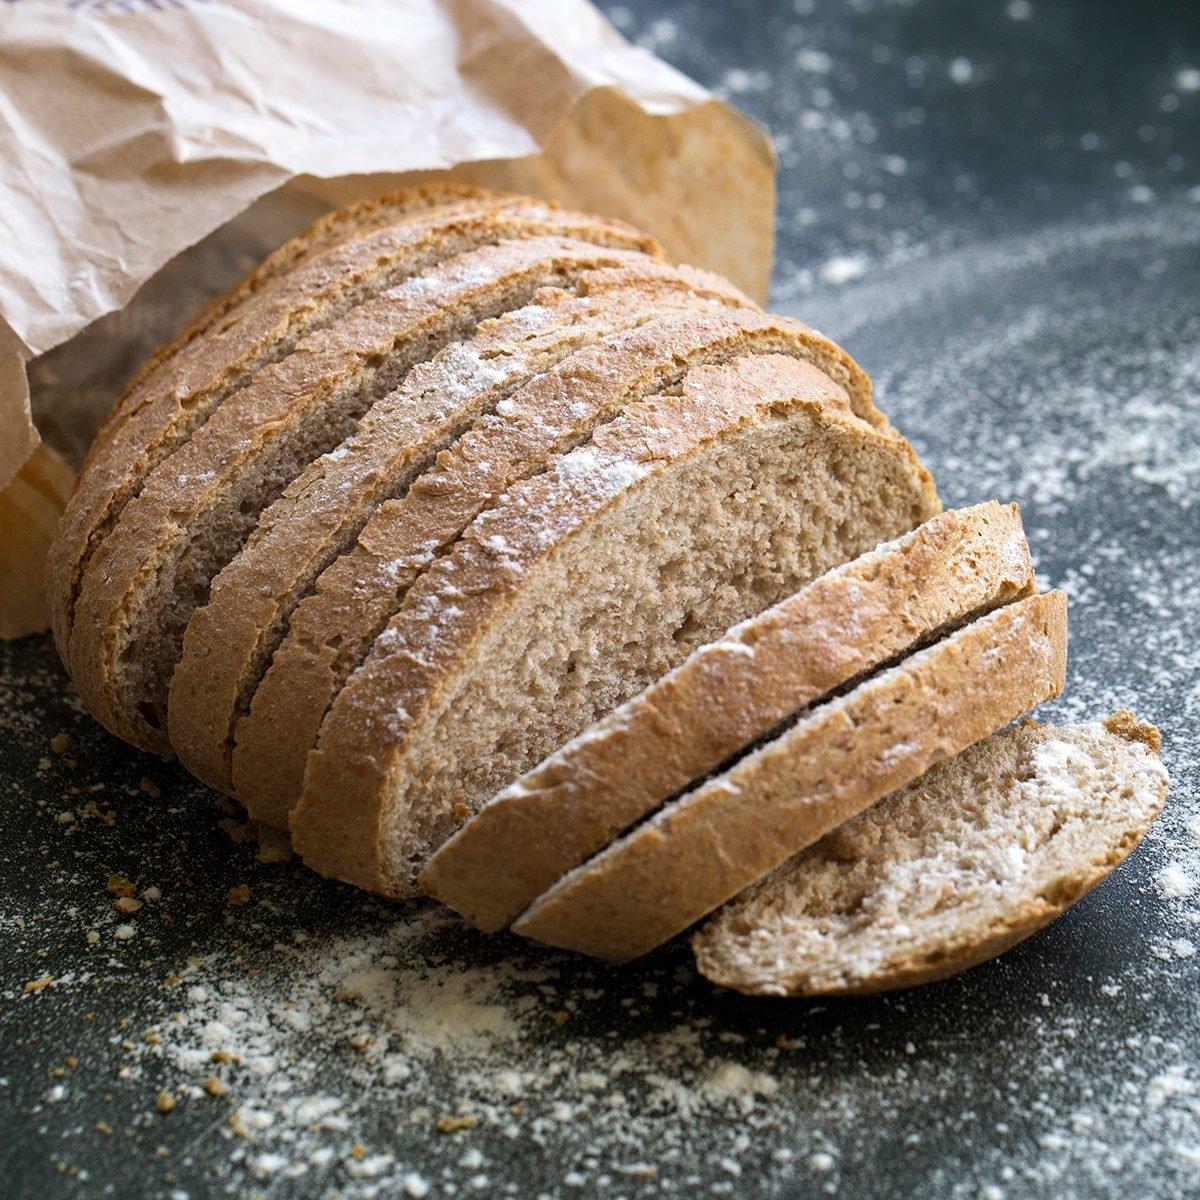 Fresh Sliced whole grain loaf of bread